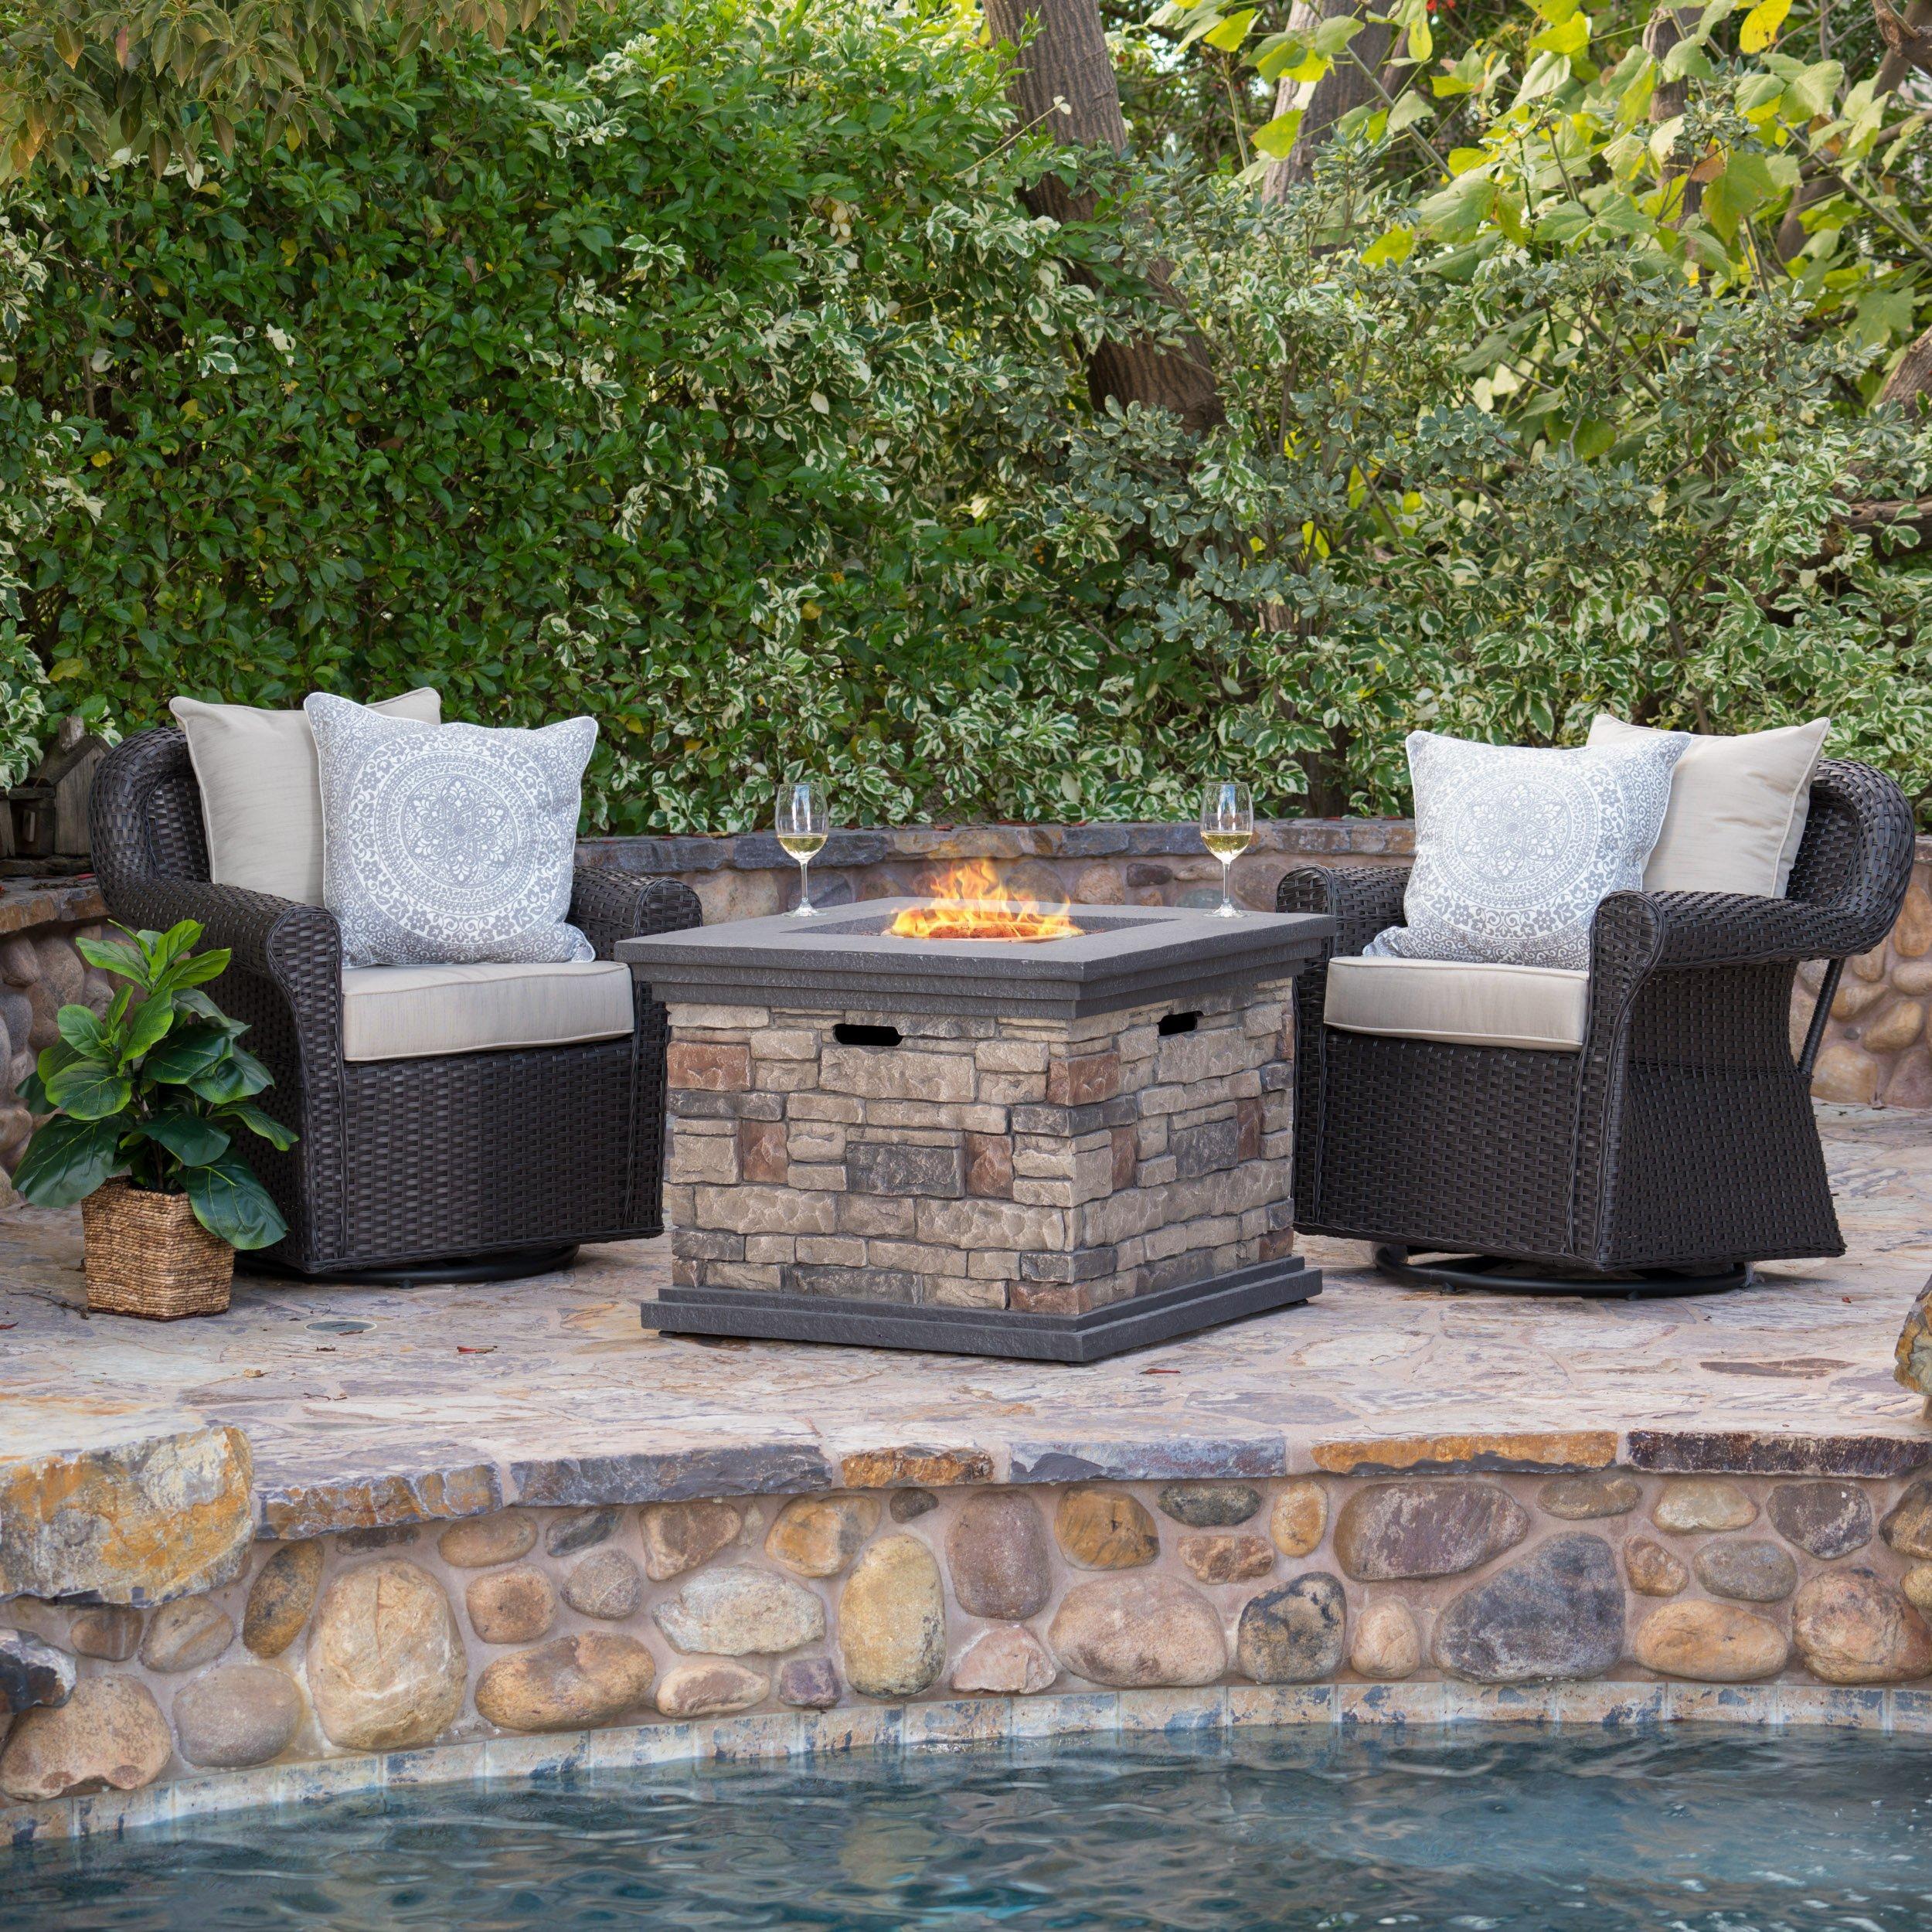 Augusta Patio Furniture ~ 3 Piece Outdoor Wicker Swivel Rocker and Propane (Gas) Fire Table (pit) Set